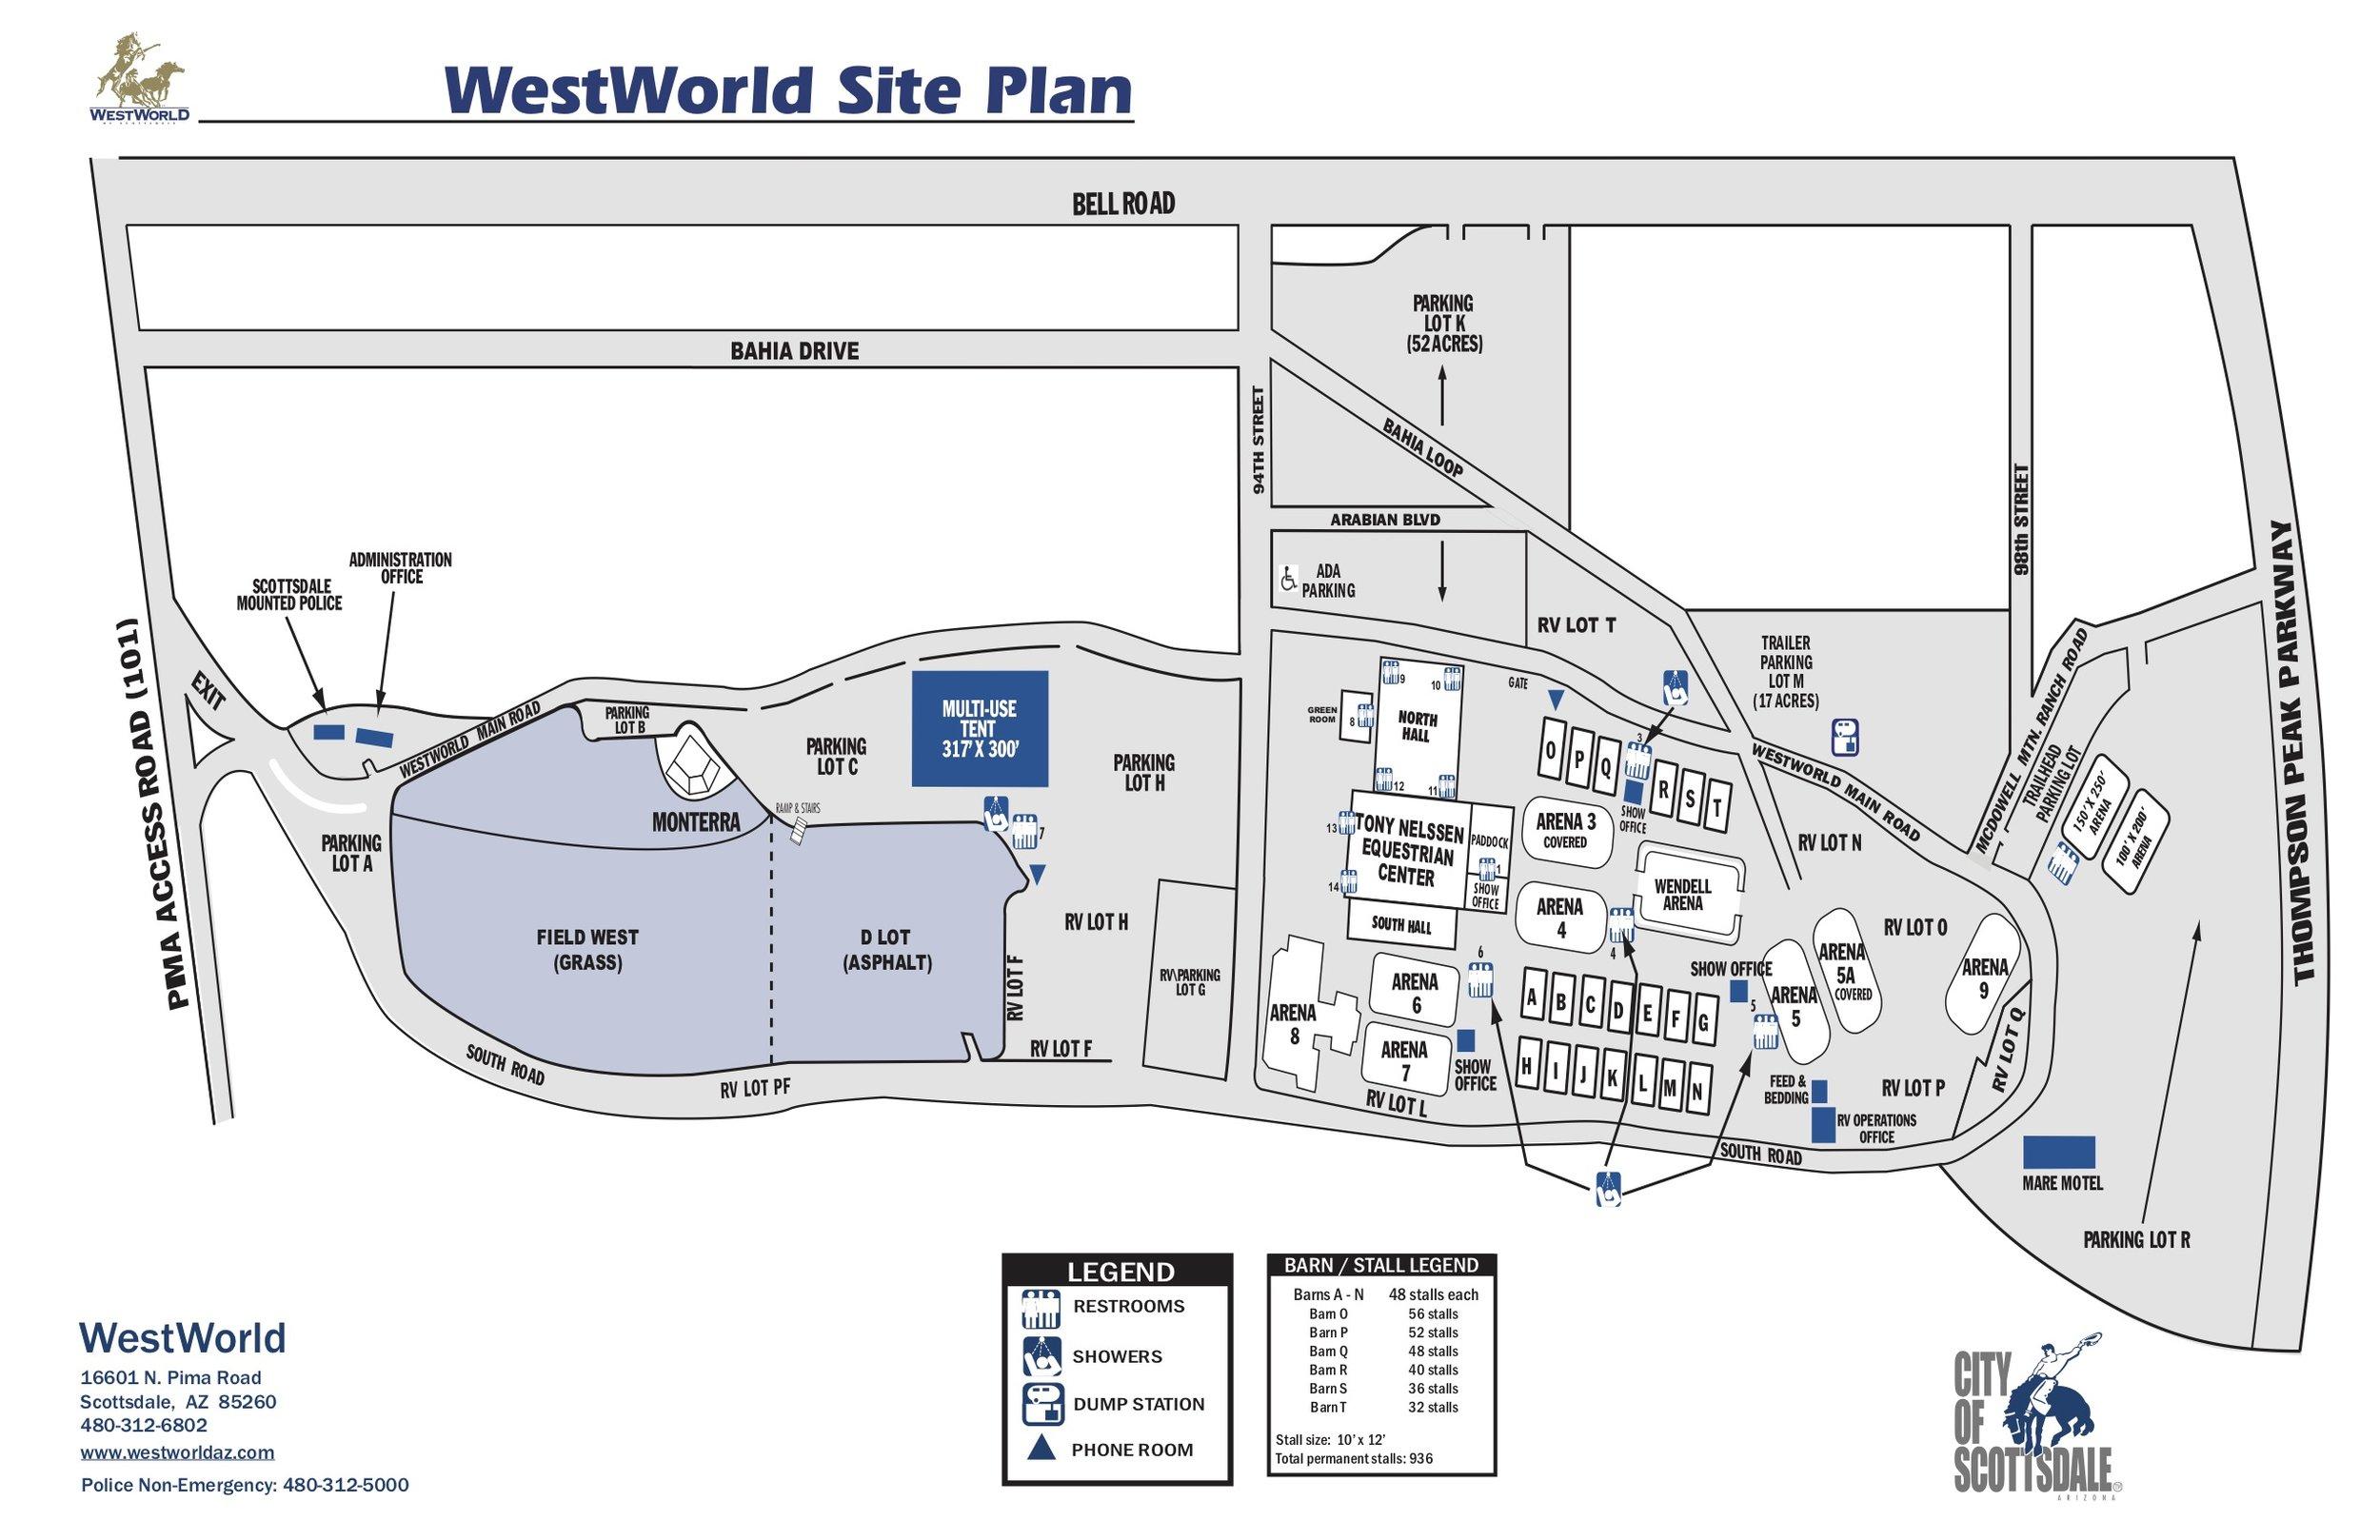 WestWorld Site Plan_04-05-2016 copy.jpg